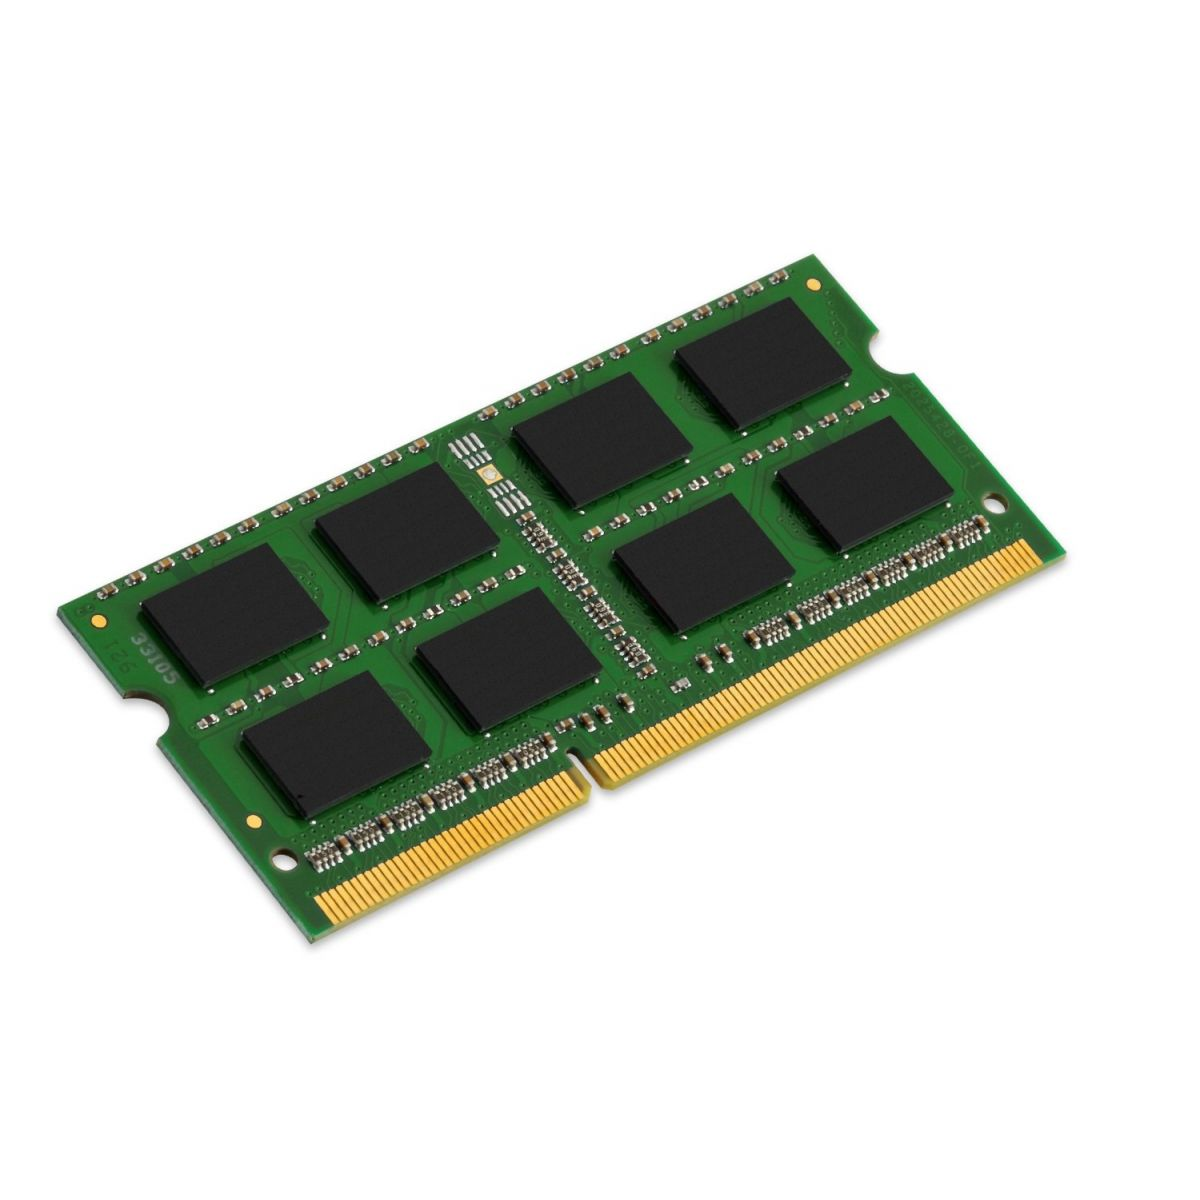 Memória para Apple 4GB DDR3 1600Mhz Sodimm KTA-MB1600S/4G - Kingston